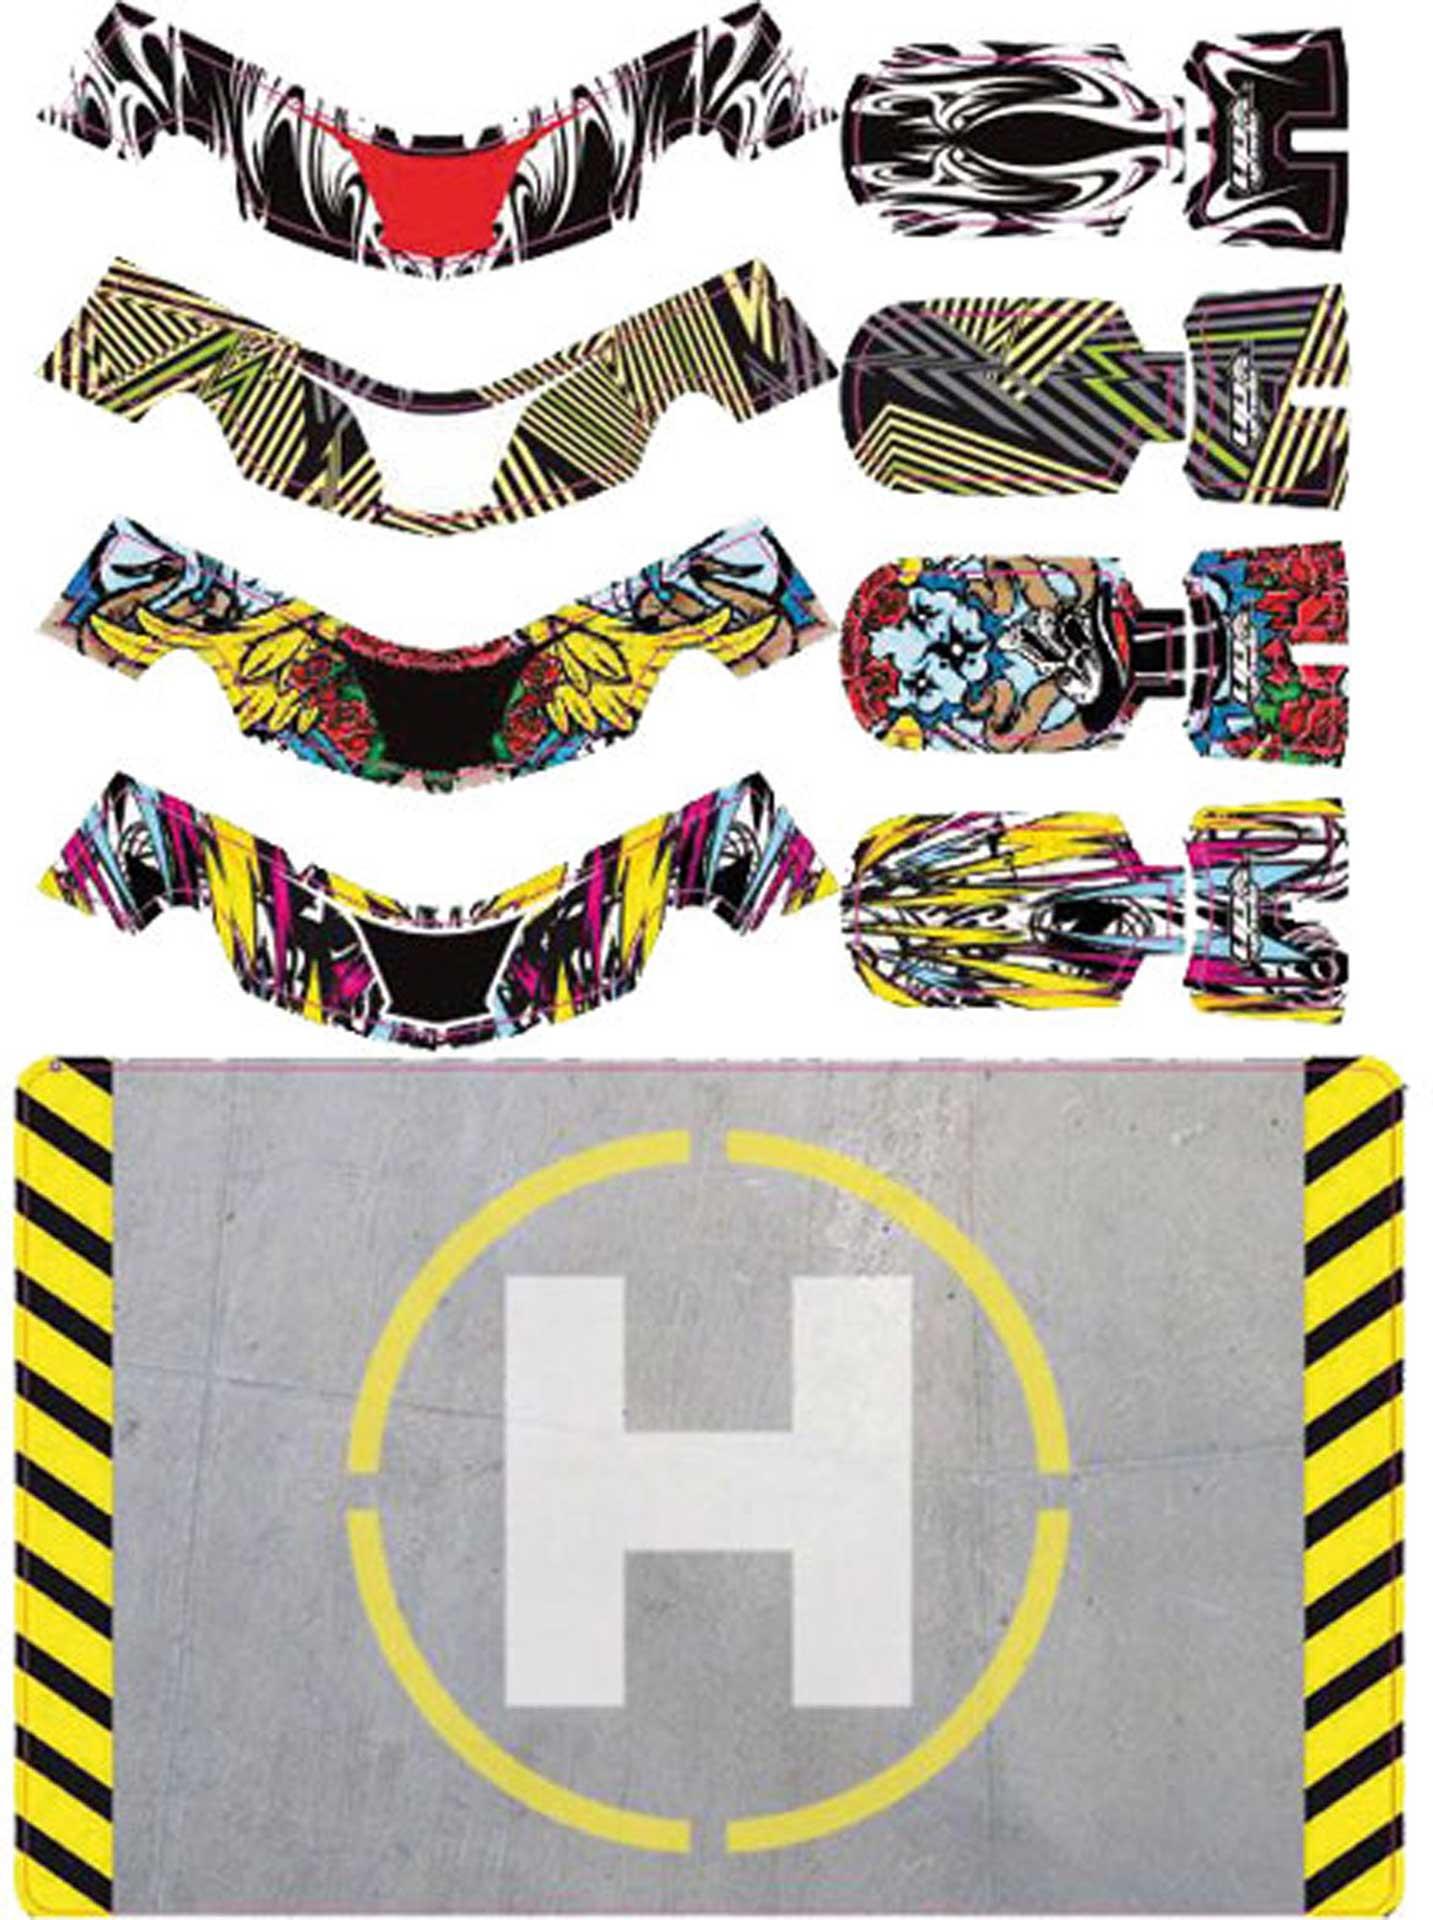 HOBBYZONE FAZE STICKER SET 2 + HELIPAD